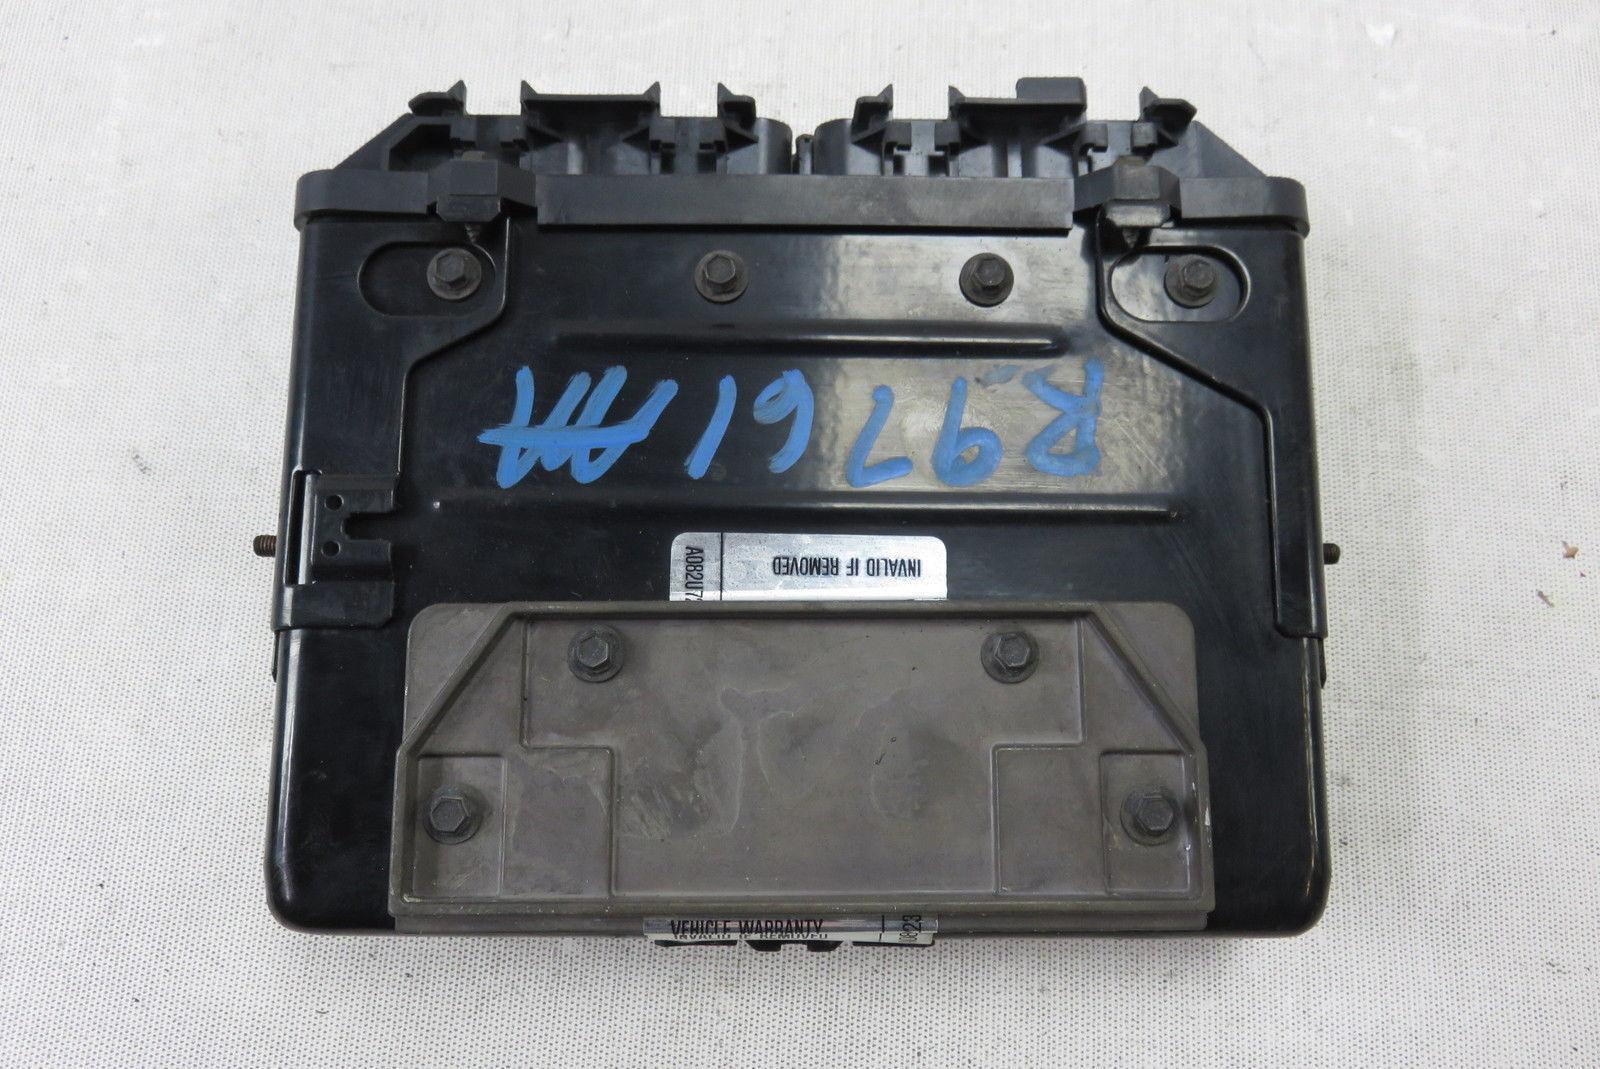 95 Lotus Esprit S4S 22 Turbo Engine Ecm Ecu Computer L0920099